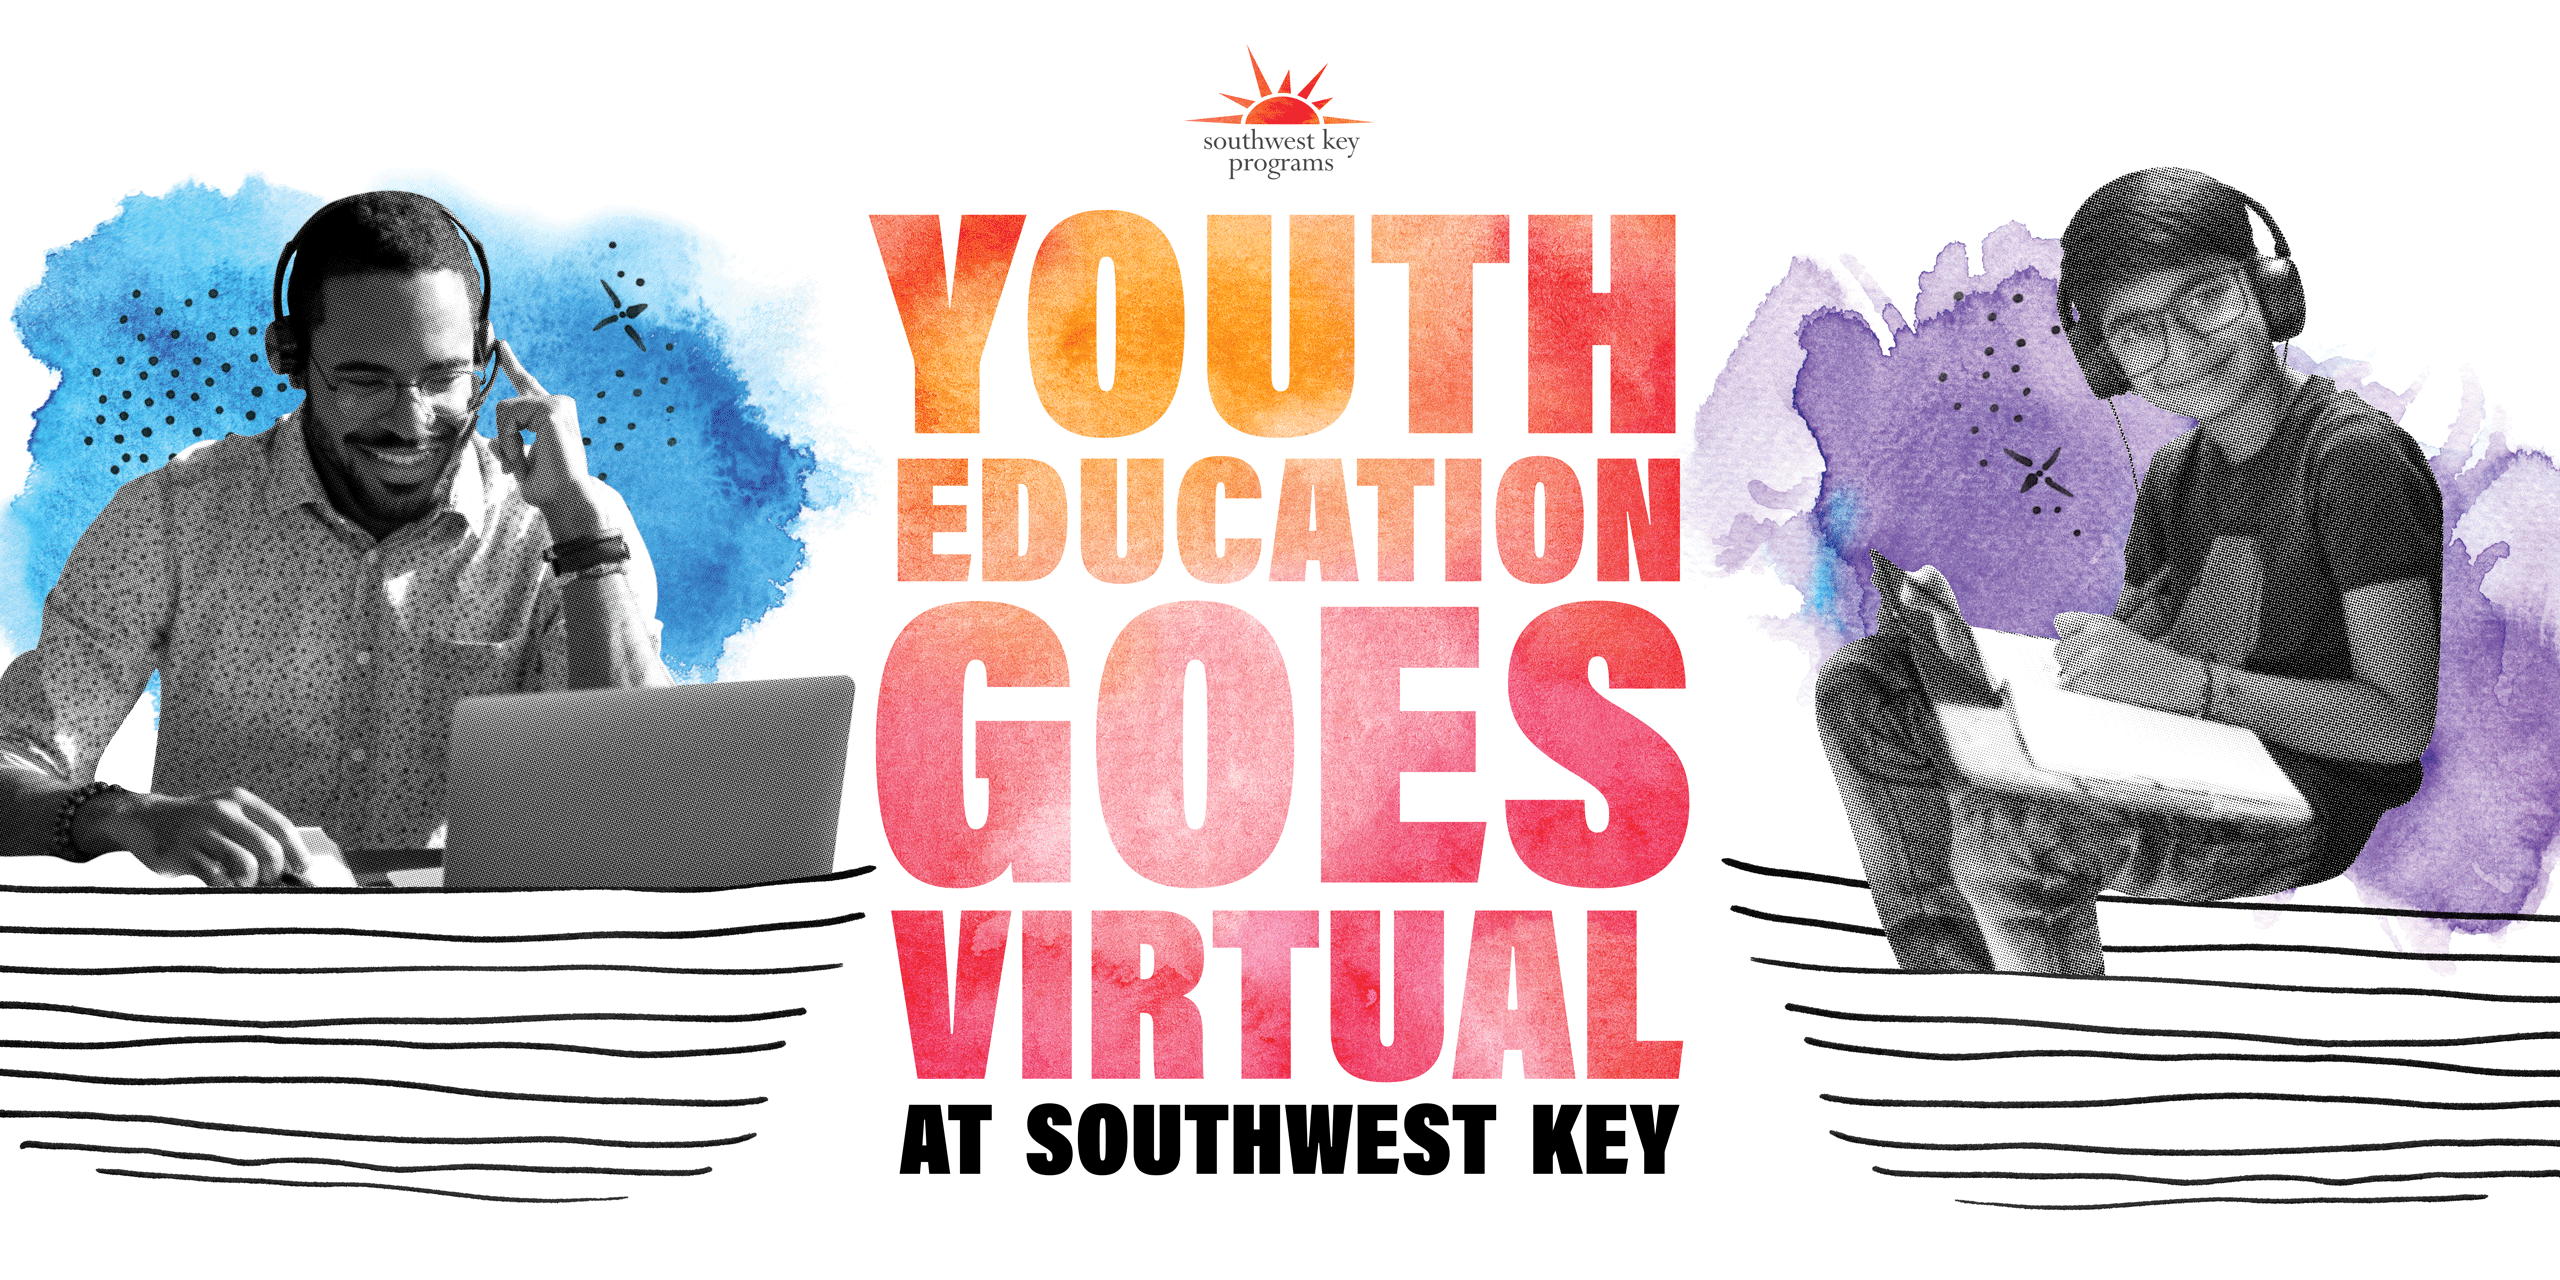 Education goes virtual graphic